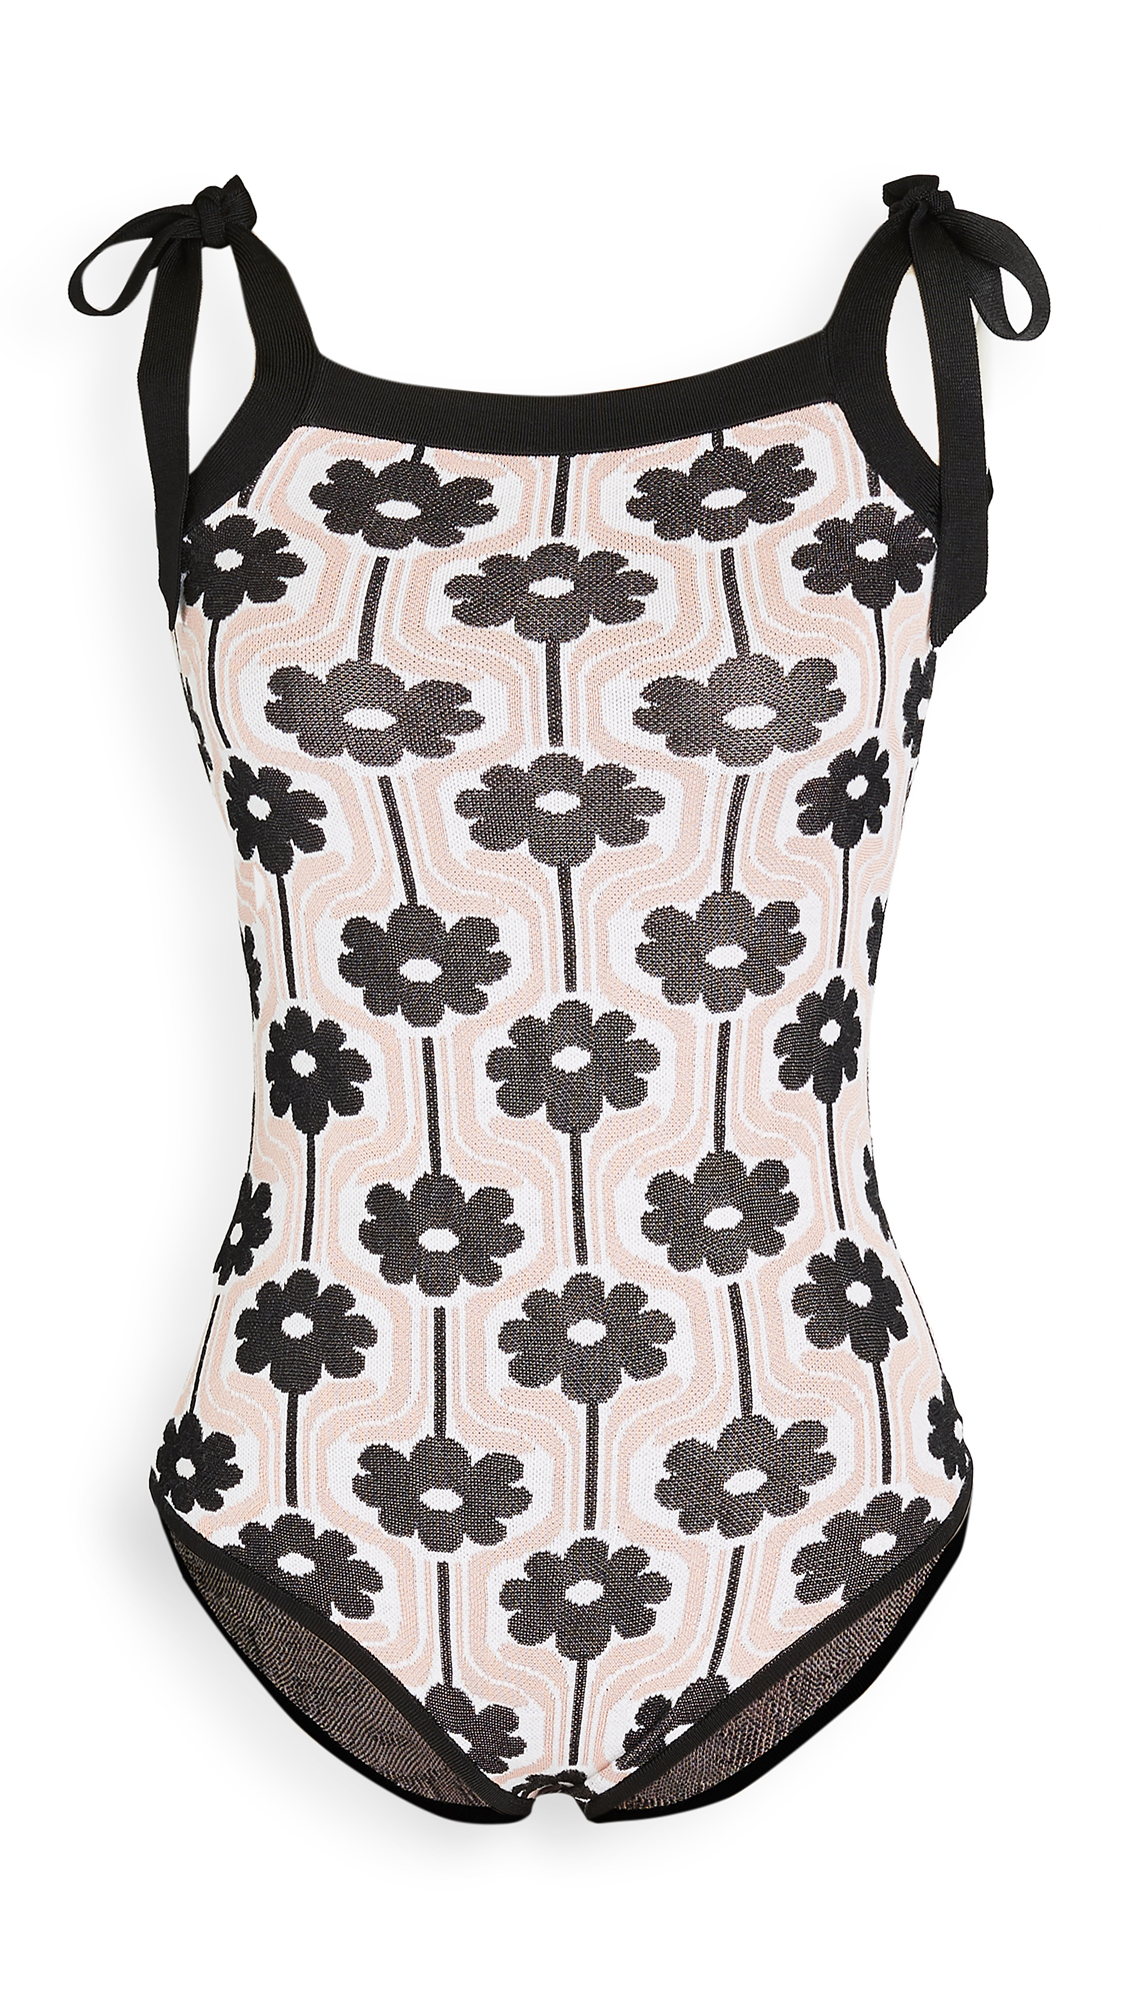 JoosTricot Floral Bodysuit